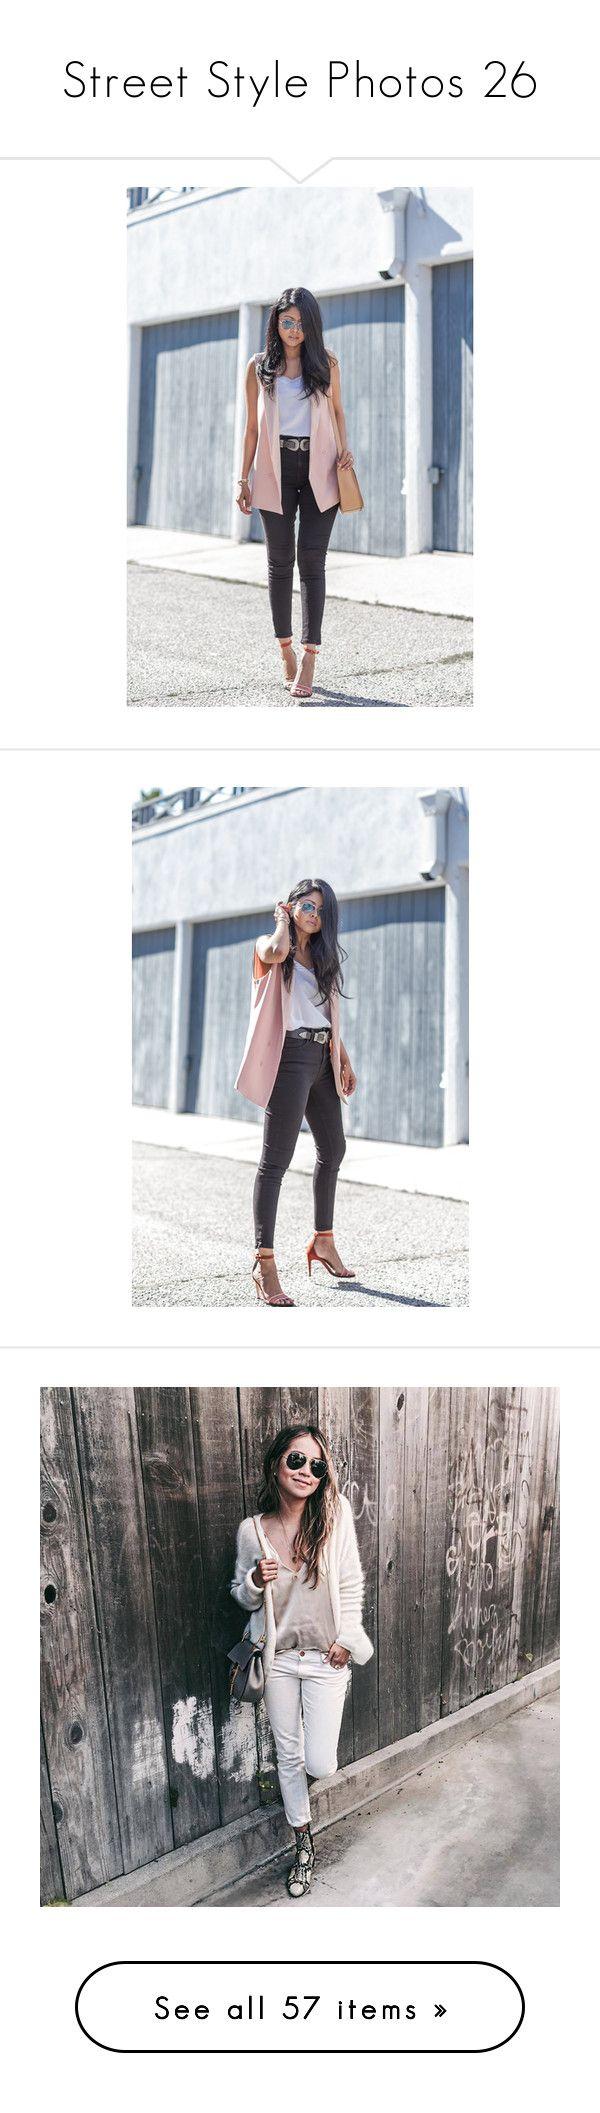 """Street Style Photos 26"" by chocolatepumma ❤ liked on Polyvore featuring outerwear, coats, camel coat, white coat, maternity, jackets, blazers, grey, gray tuxedo jacket and gray blazer"